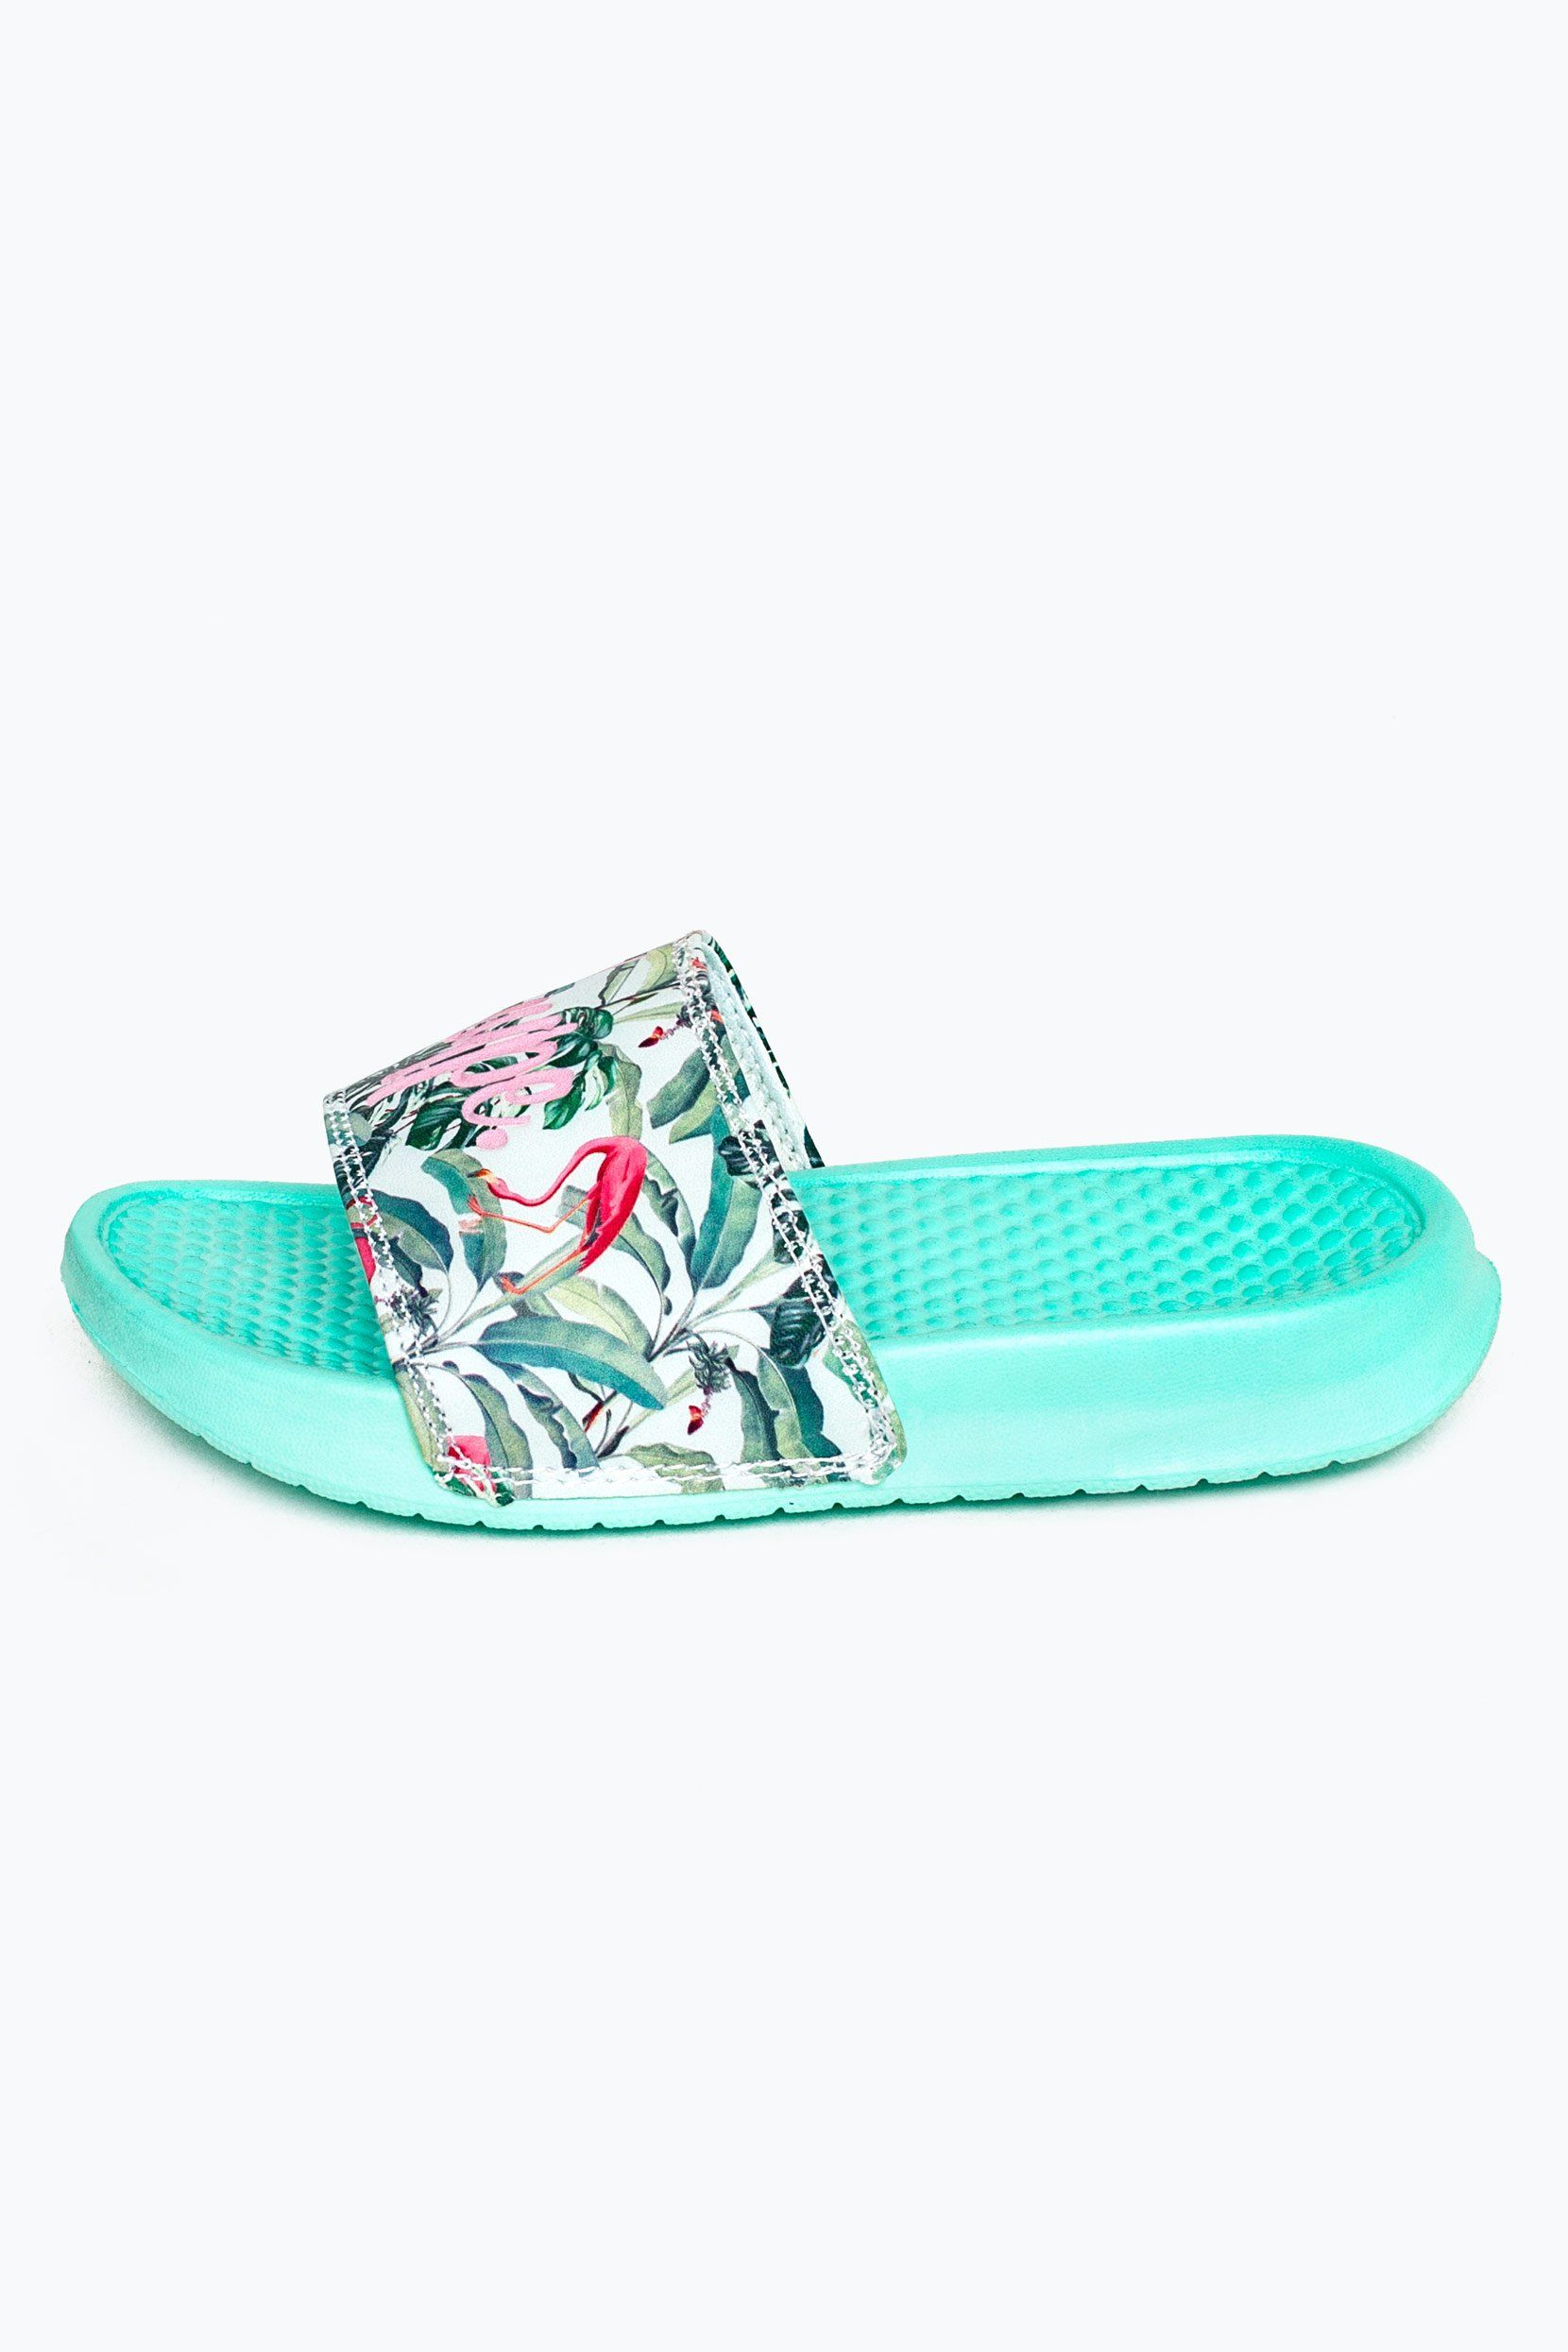 Hype Mint Flamingo Paradise Kids Sliders